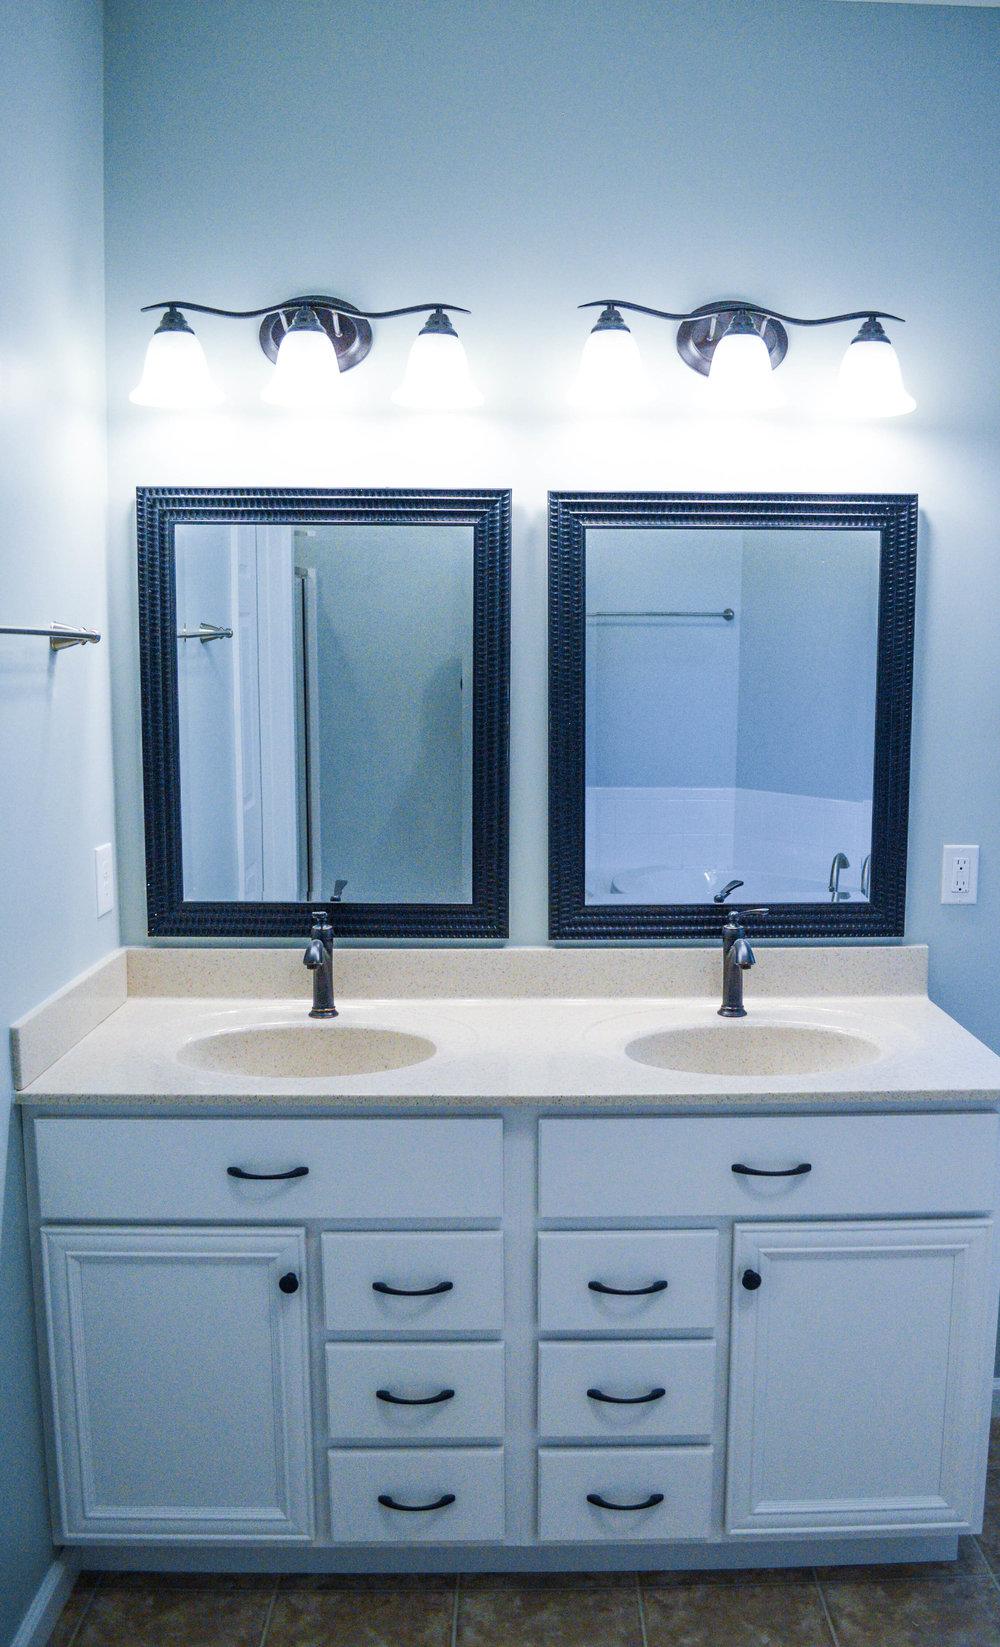 Bathrooms - Cincinnati Ohio Bath Re-Model — Cincinnati Custom Homes ...